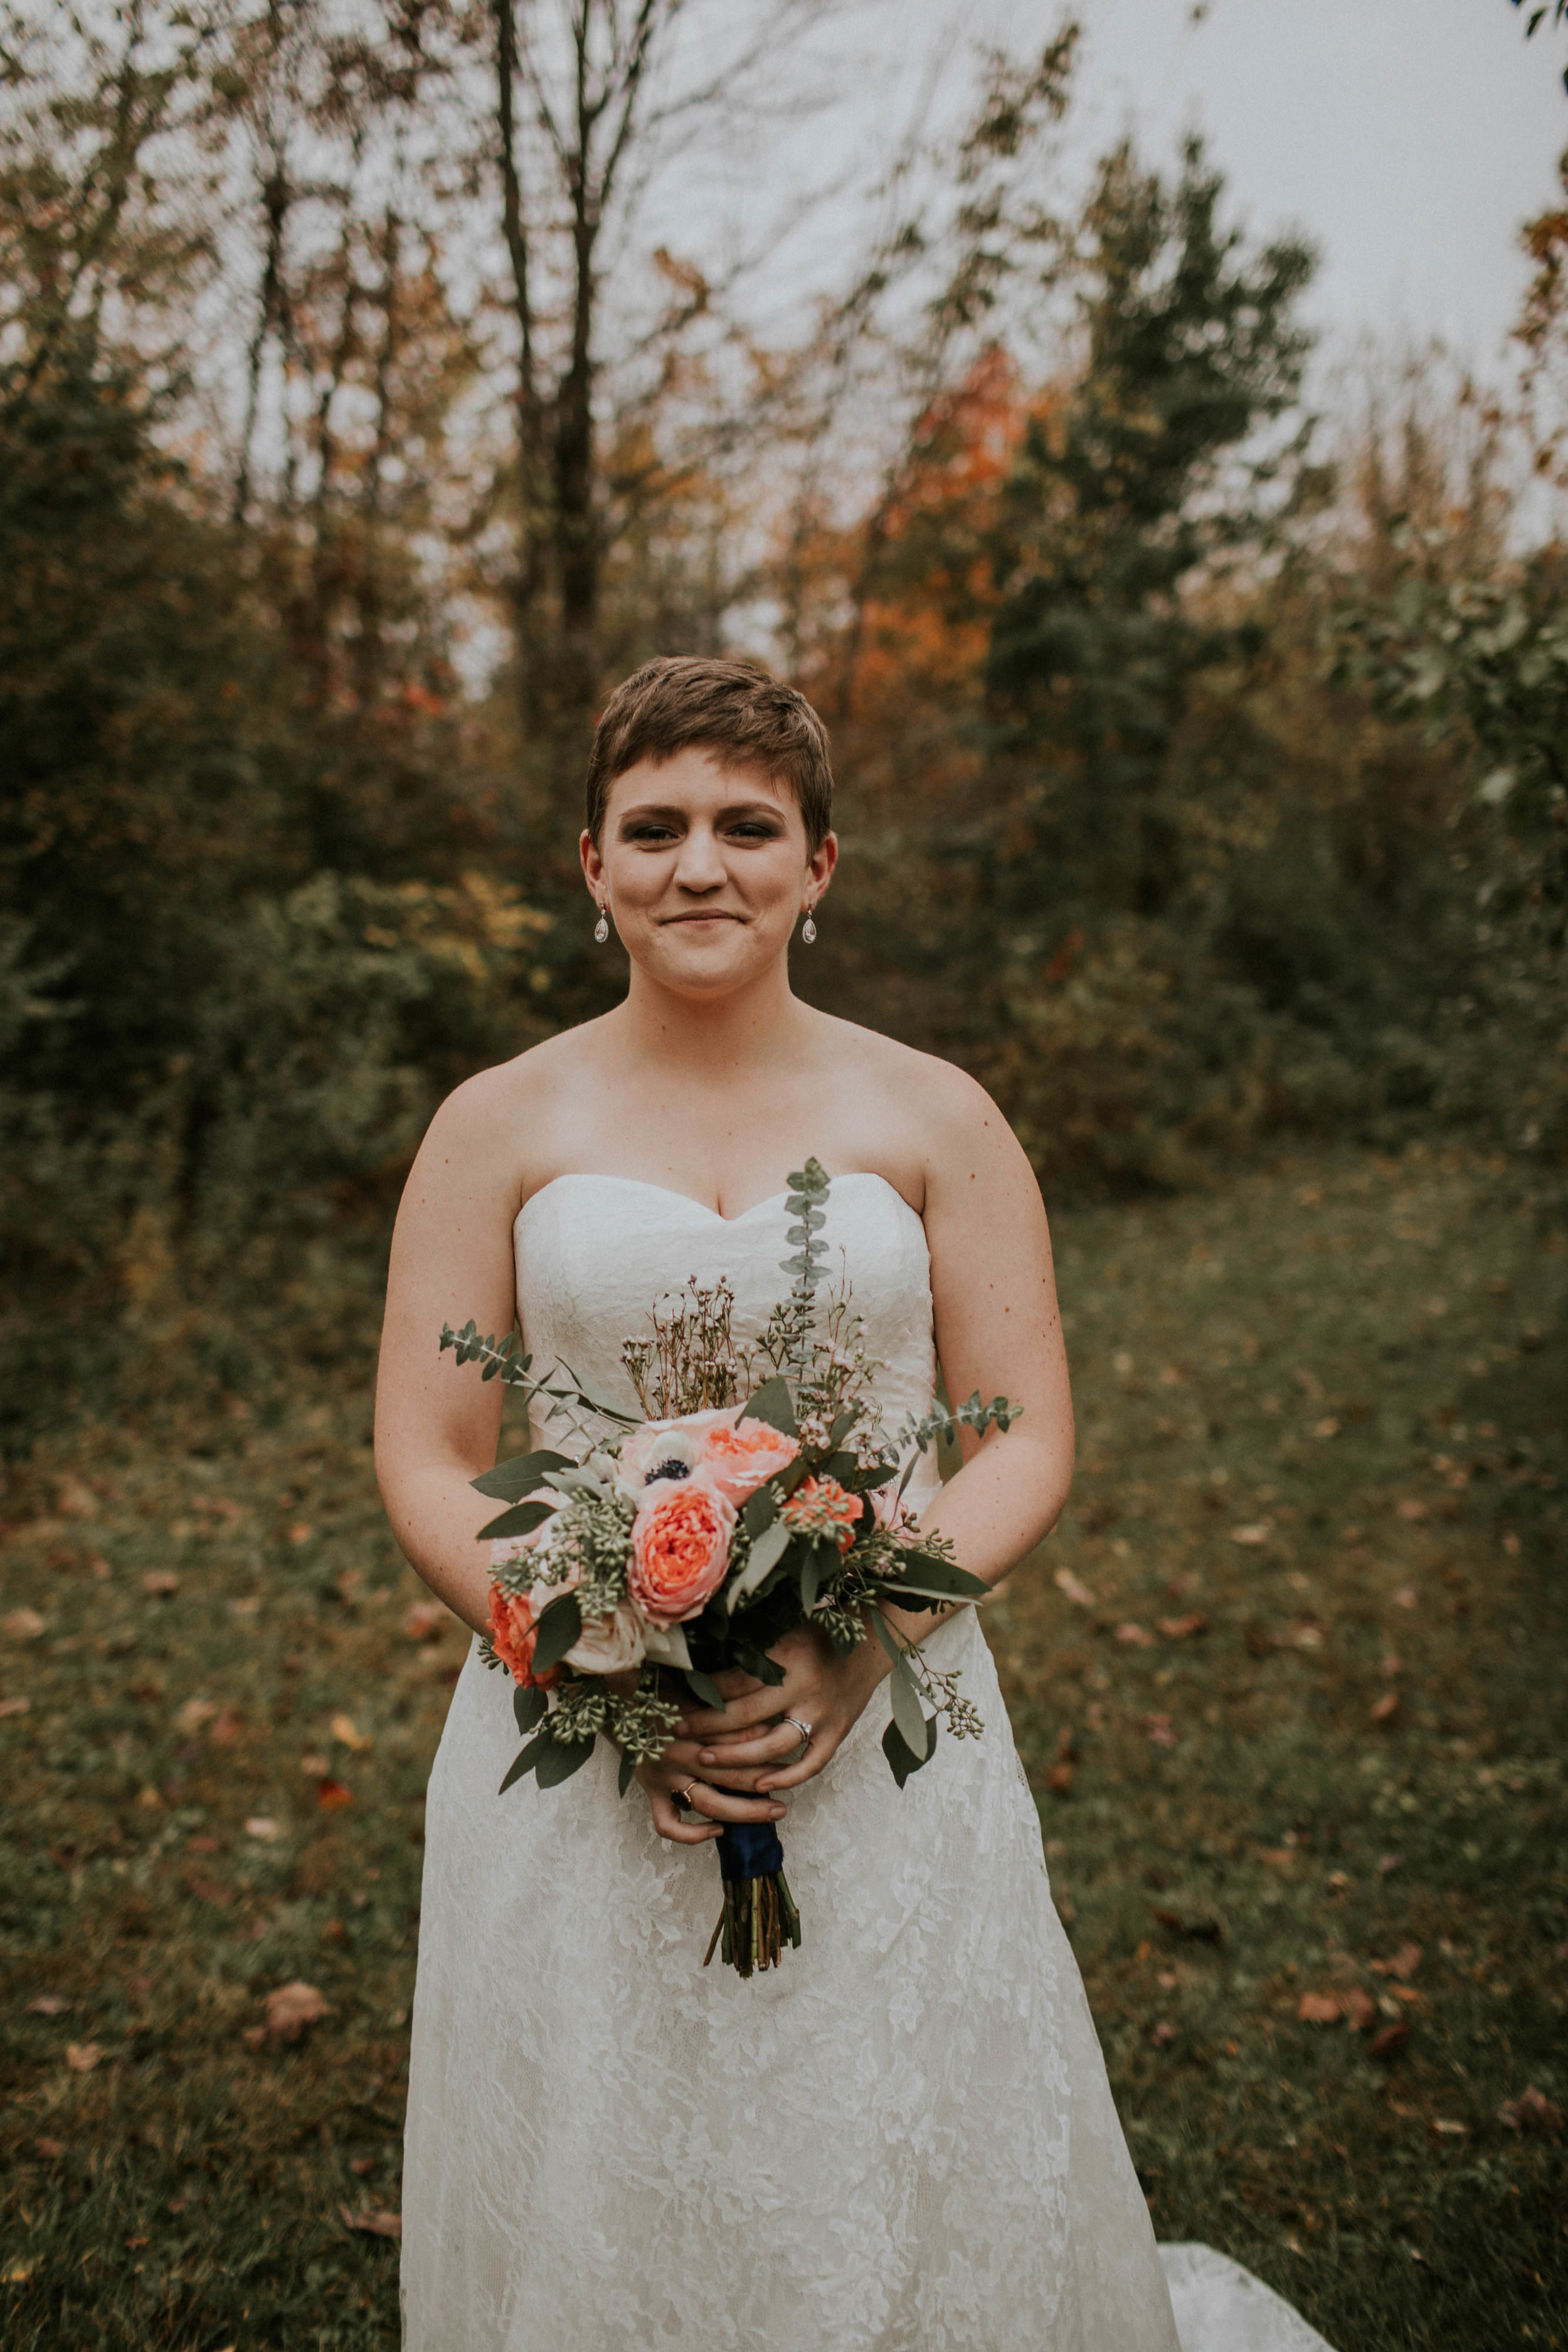 Columbus ohio wedding photographer grace e jones photography real fun joyful wedding47.jpg